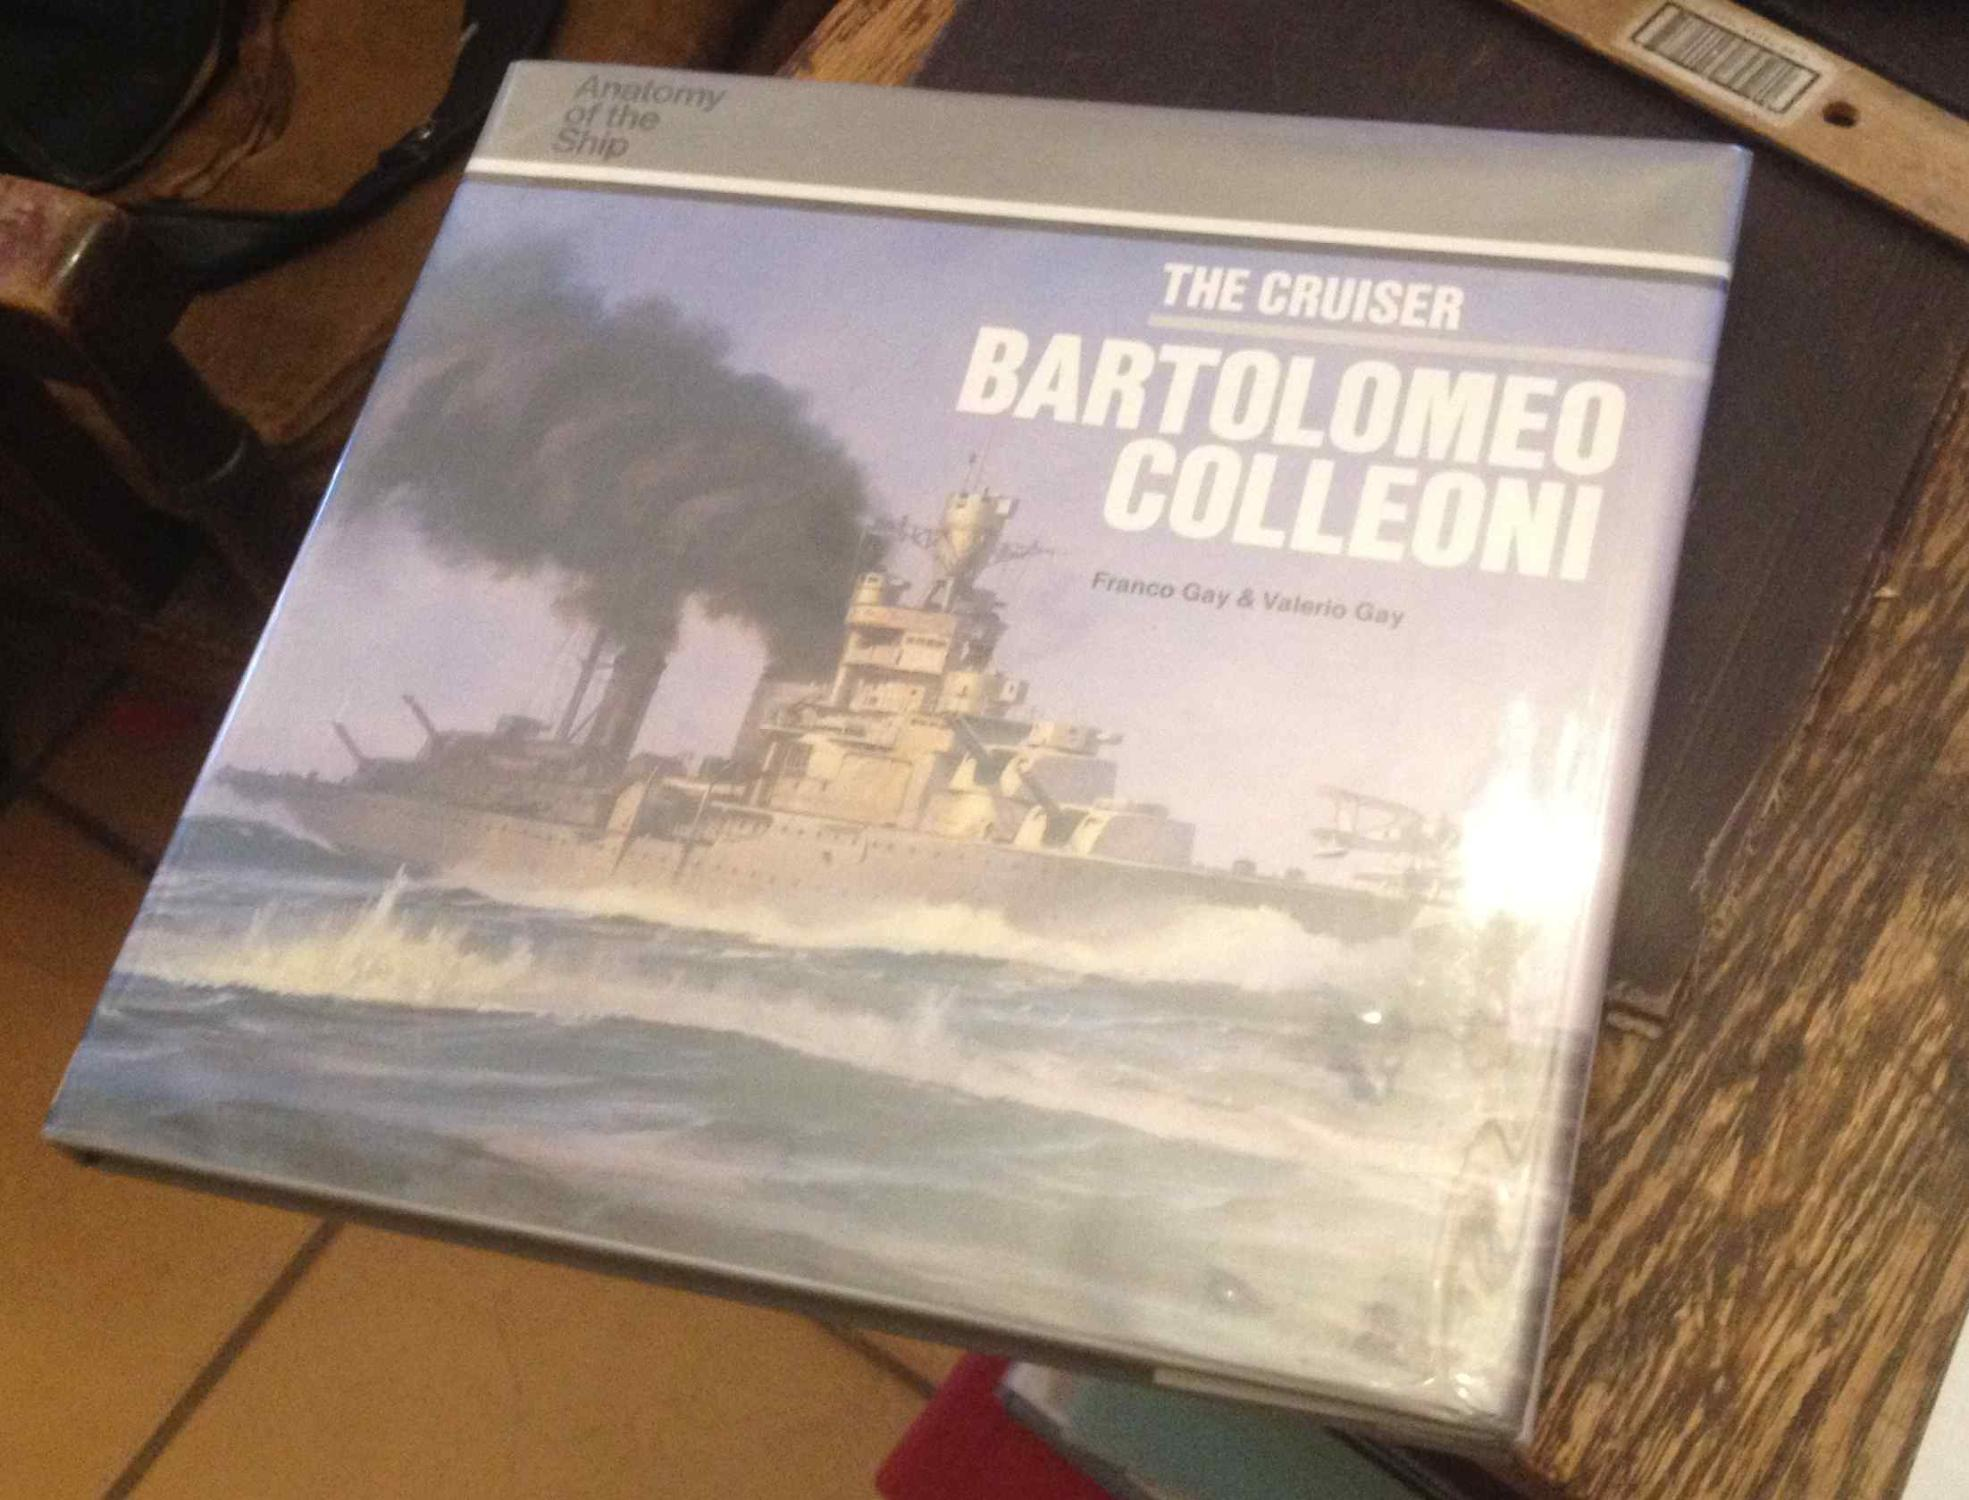 franco gay - the cruiser bartolomeo colleoni - First Edition - AbeBooks